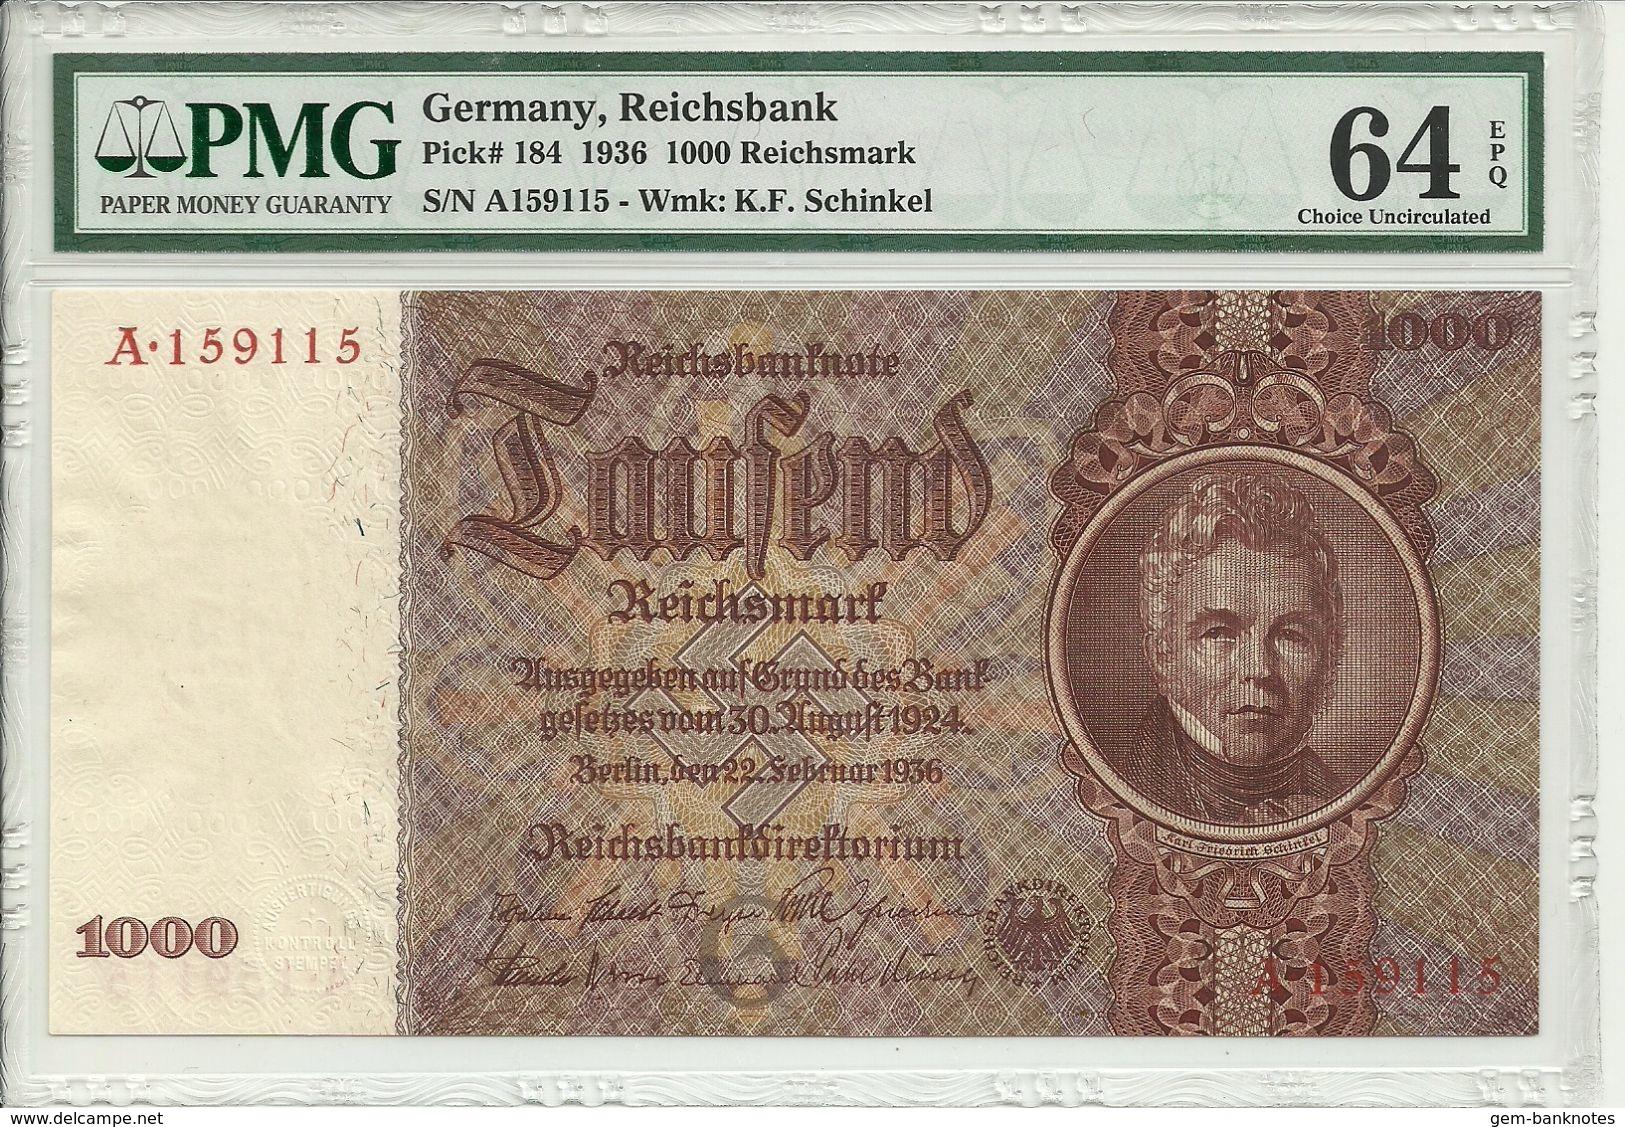 Germany, Reichsbank, 1000 Reichsmark 1936 P184 Graded 64 EPQ By PMG (Choice Uncirculated) - 1000 Reichsmark